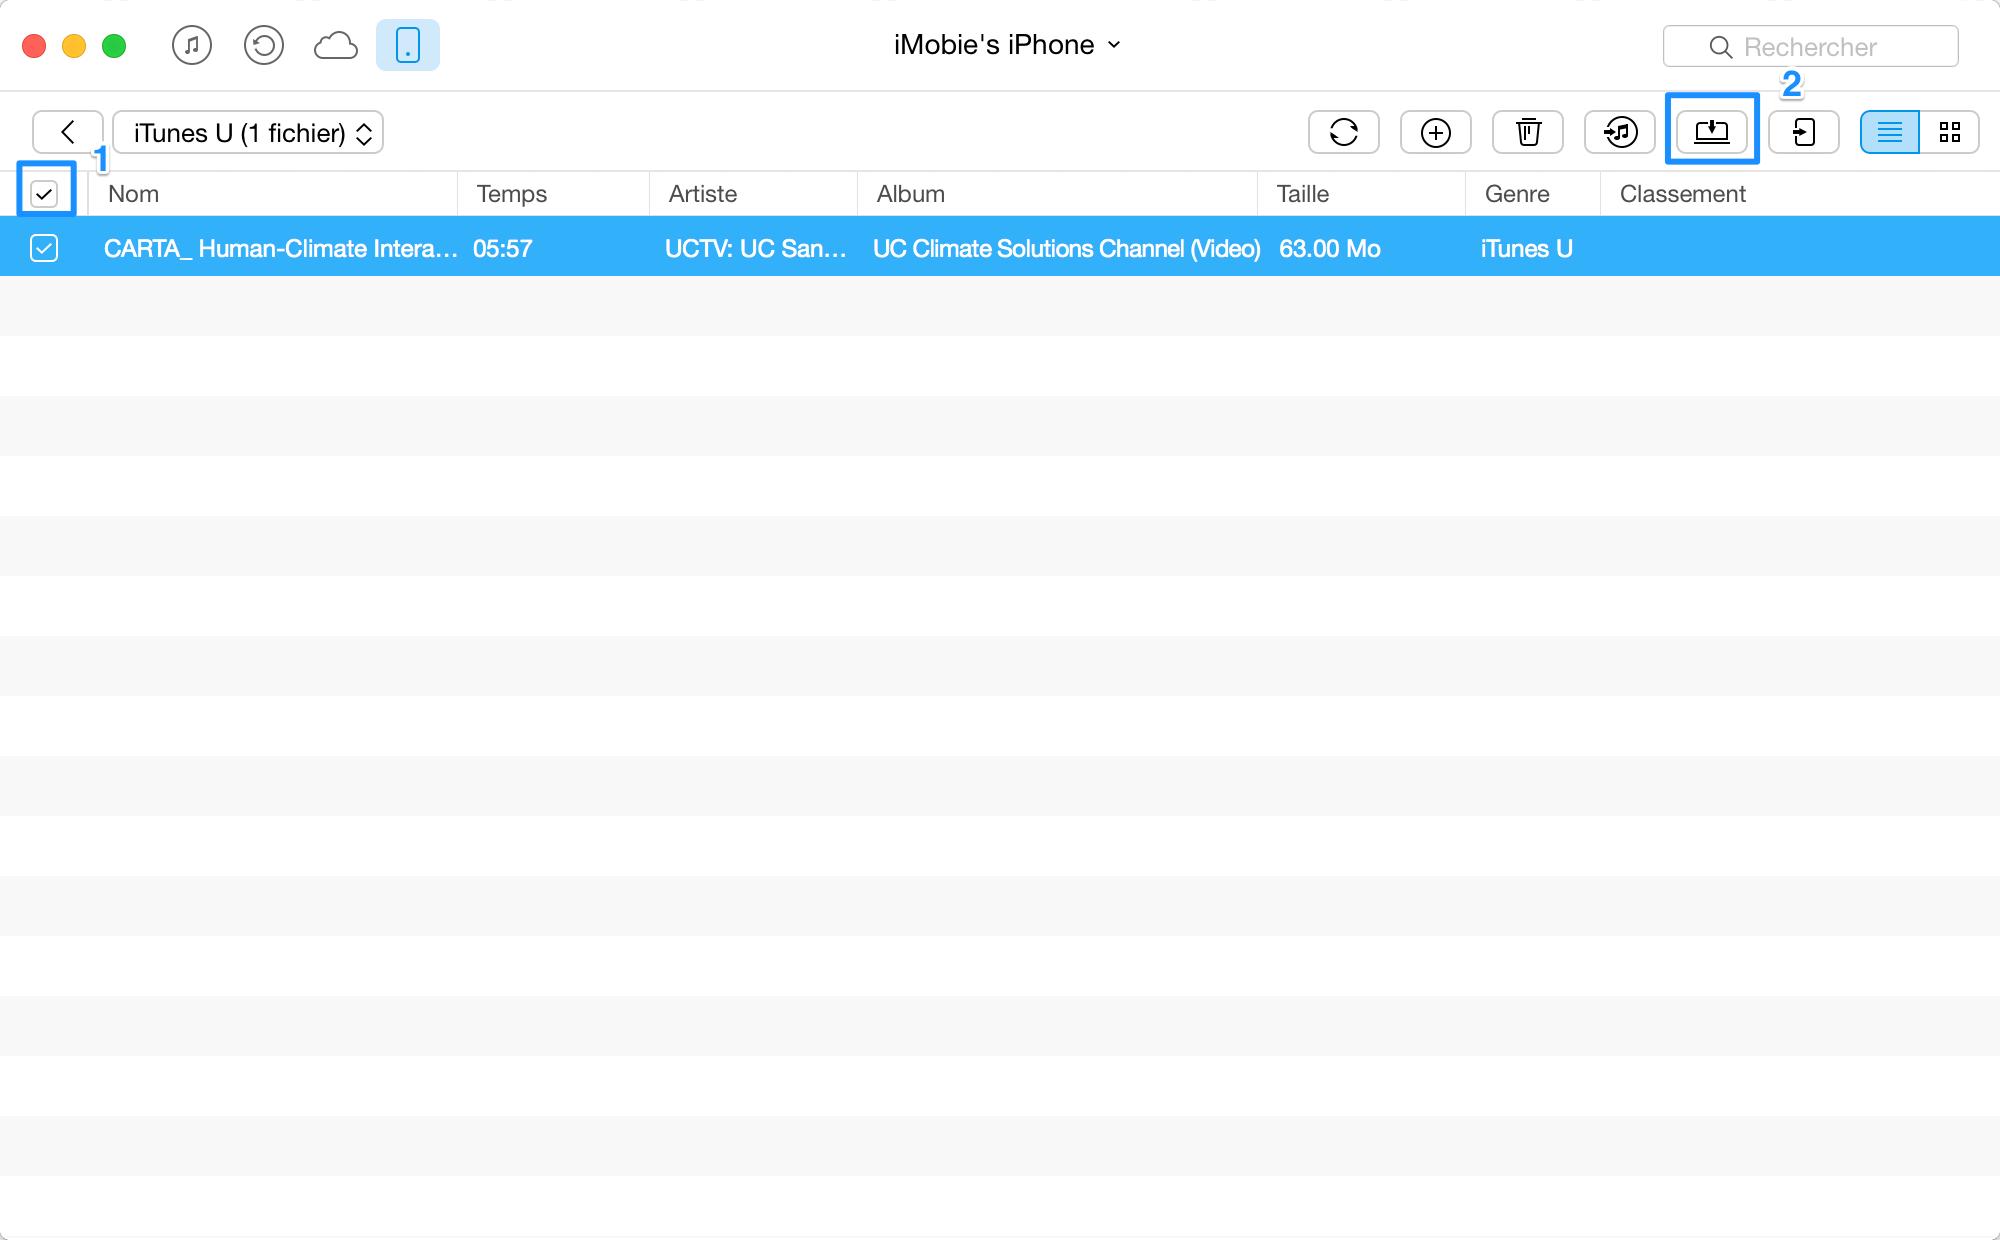 Transfert de iTunes U de l'iPhone à l'ordinateur - étape 3